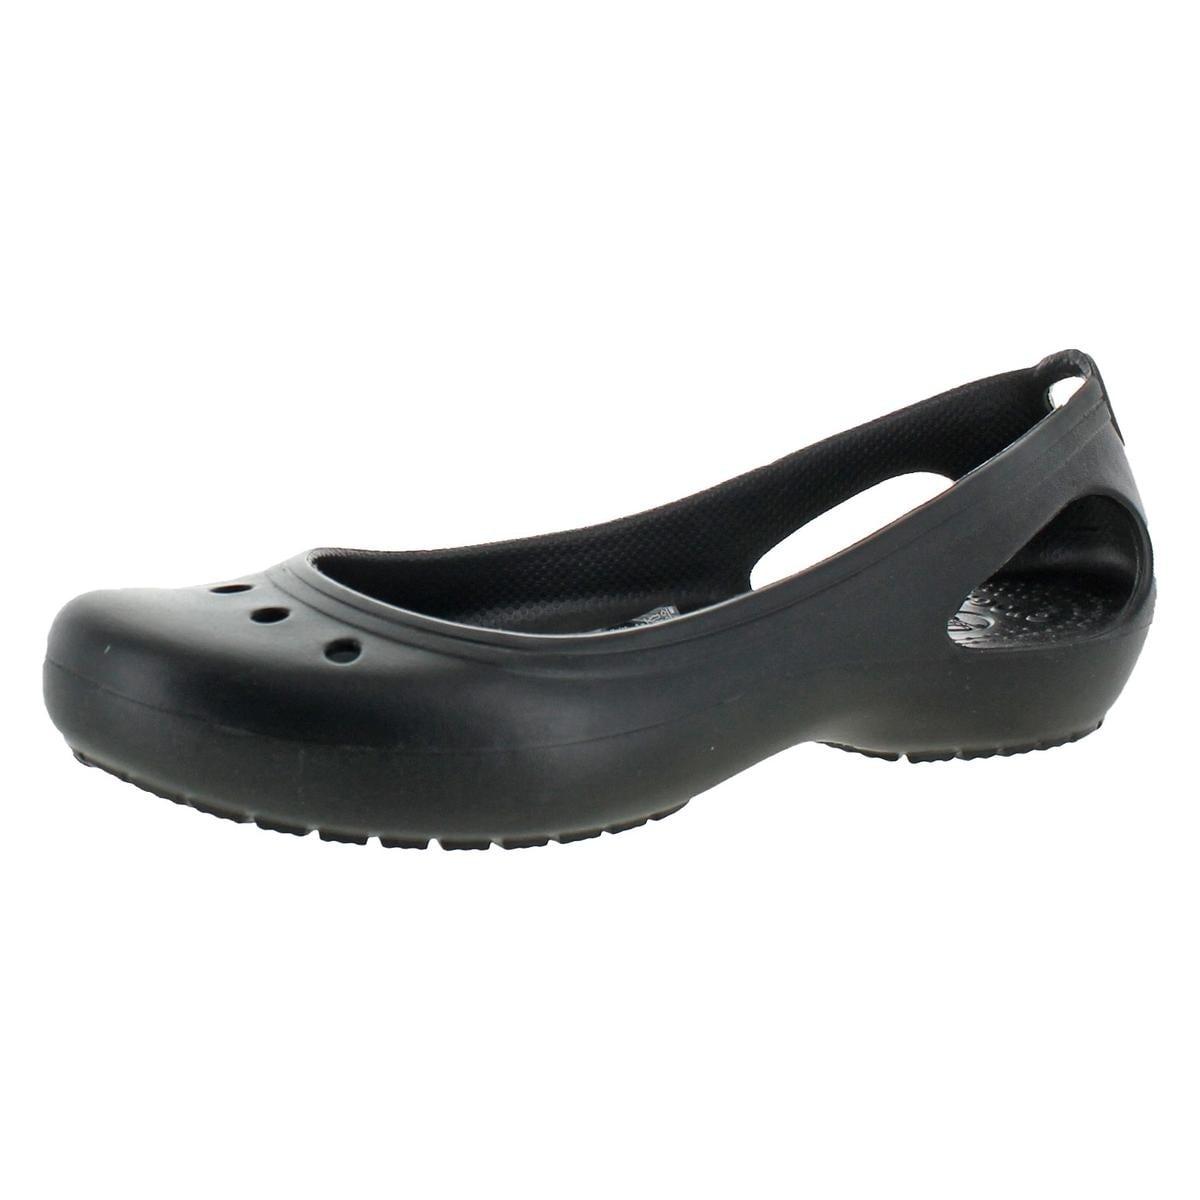 63e5f3dea0216c Shop Crocs Womens Kadee Casual Shoes Ballet Croslite - Free Shipping On  Orders Over  45 - Overstock - 23076421